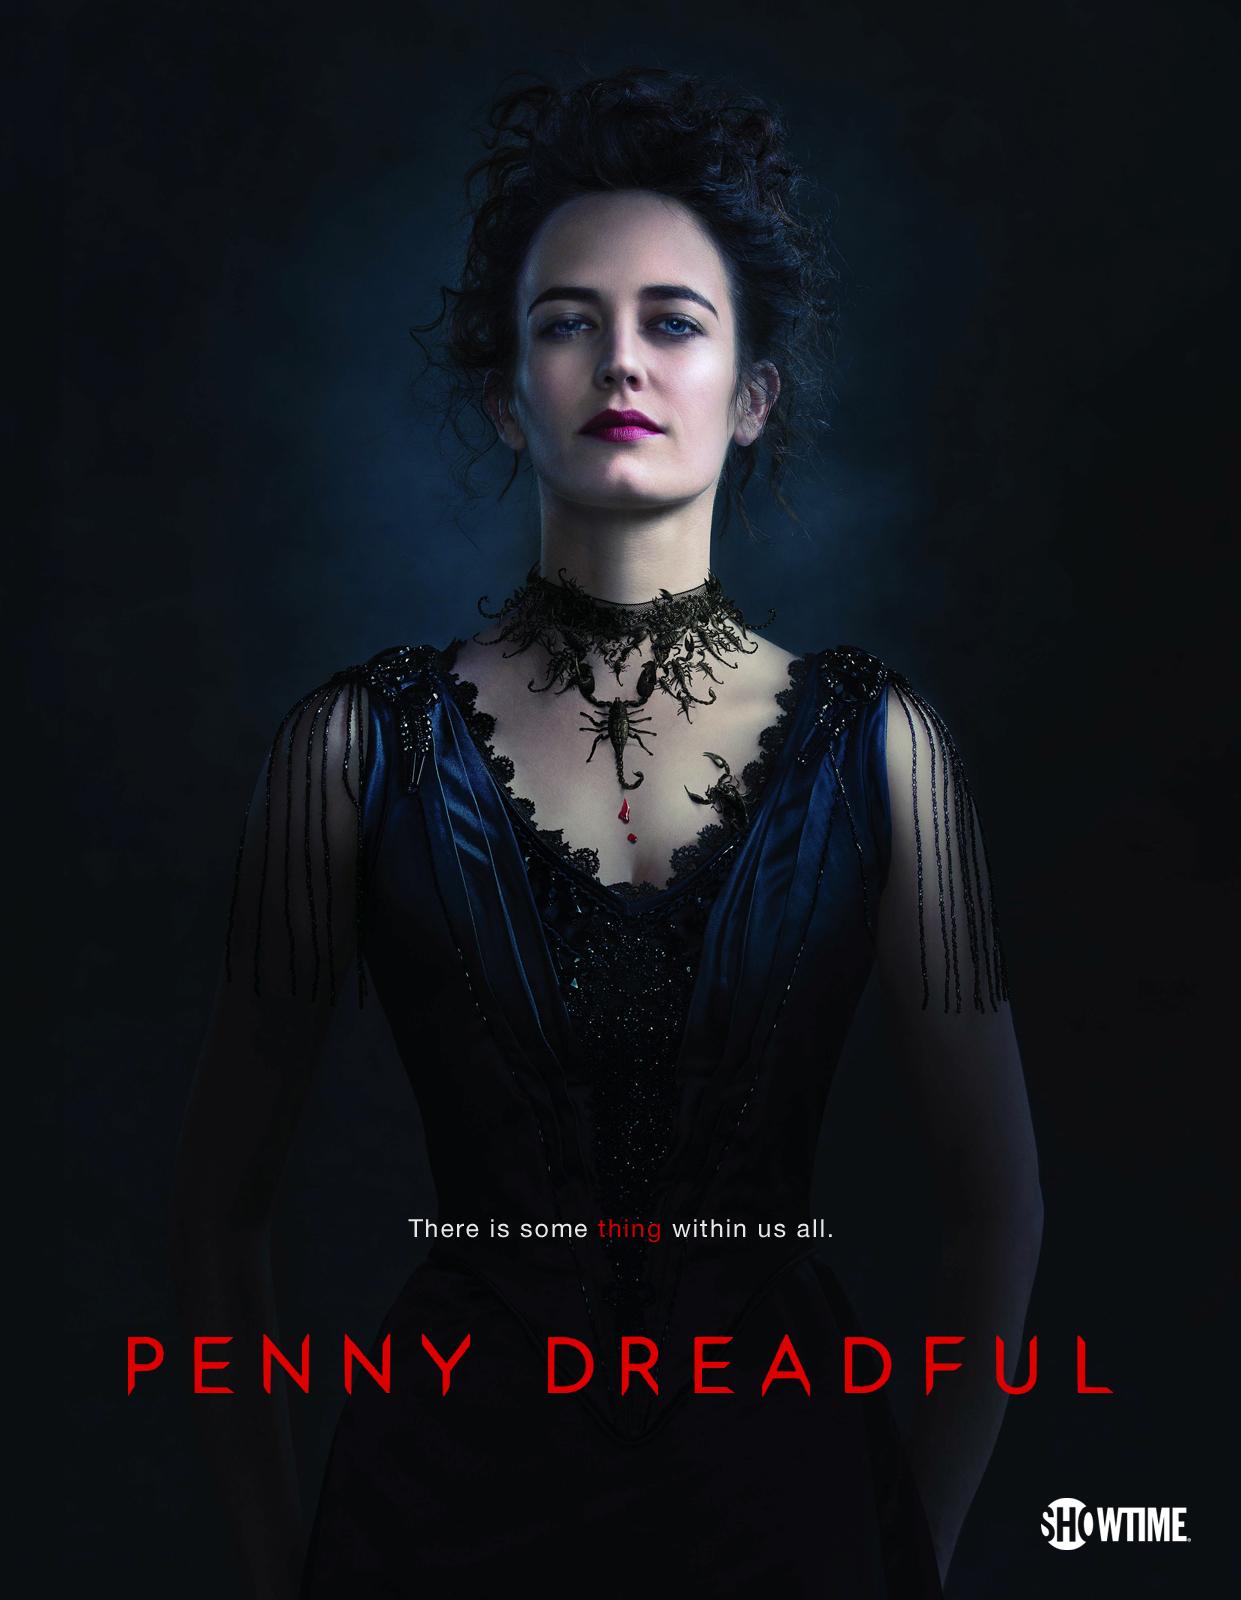 Penny Dreadful S02 E10 (2014)